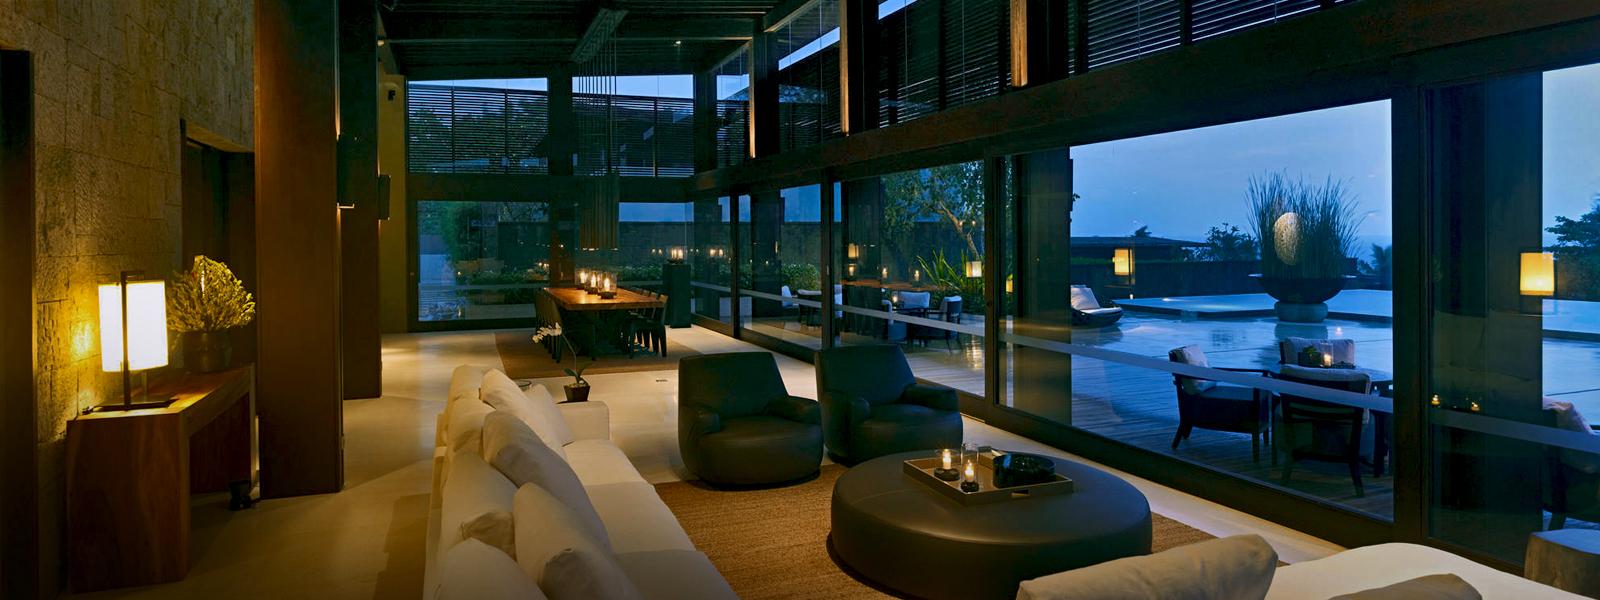 piment rouge bali lighting-manufacturer-lamps-supplier-for-hospitality-business-slider-hospitality-lighting-1